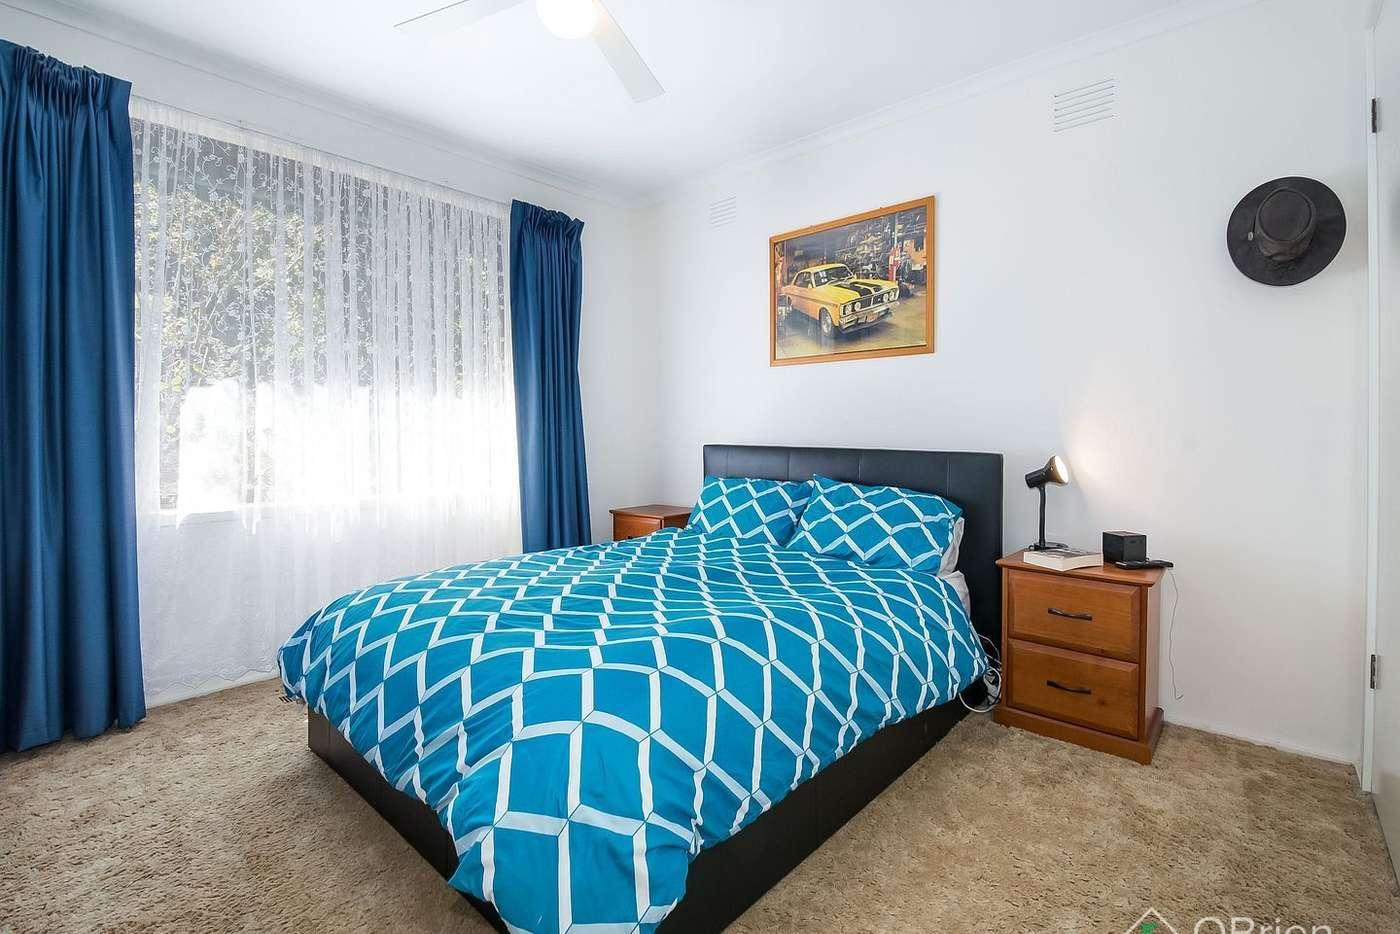 Sixth view of Homely house listing, 36 Blackwood Street, Tecoma VIC 3160